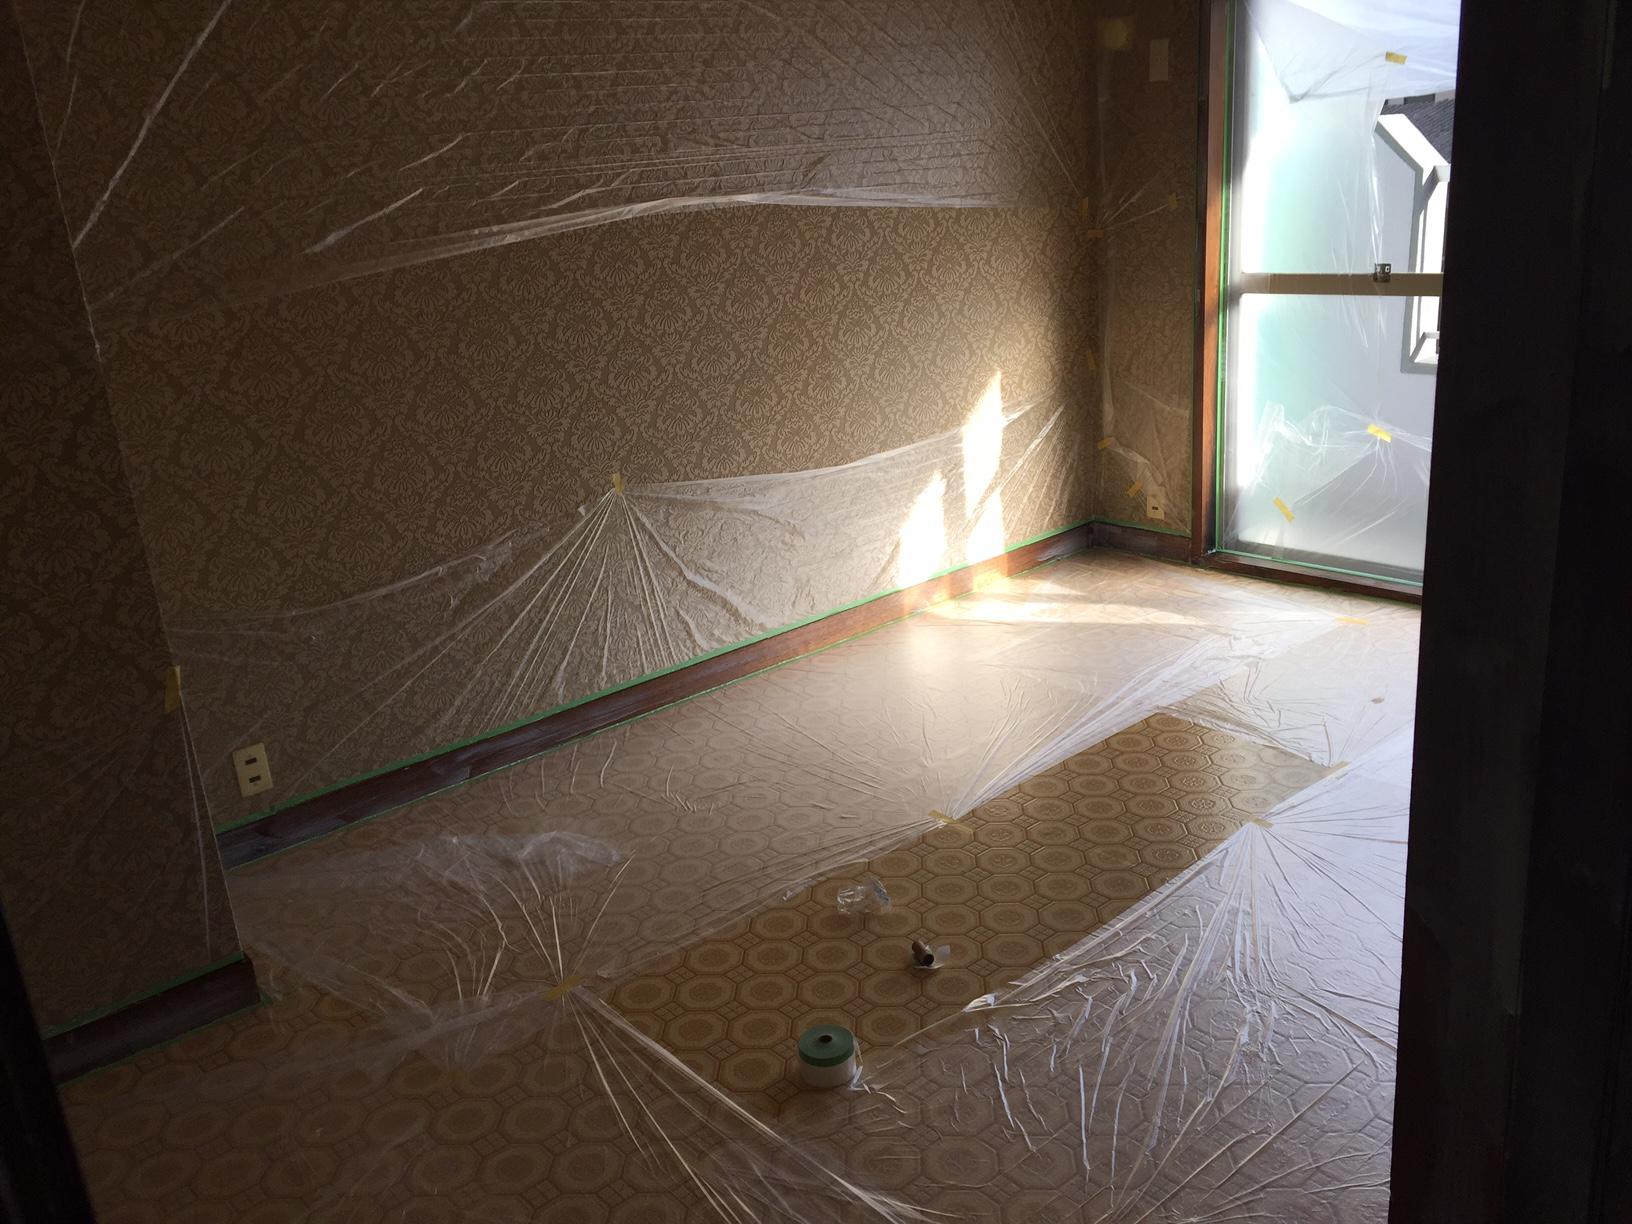 Diy 洋室の木部をホワイトに塗装しました まずはこちらの壁や床に